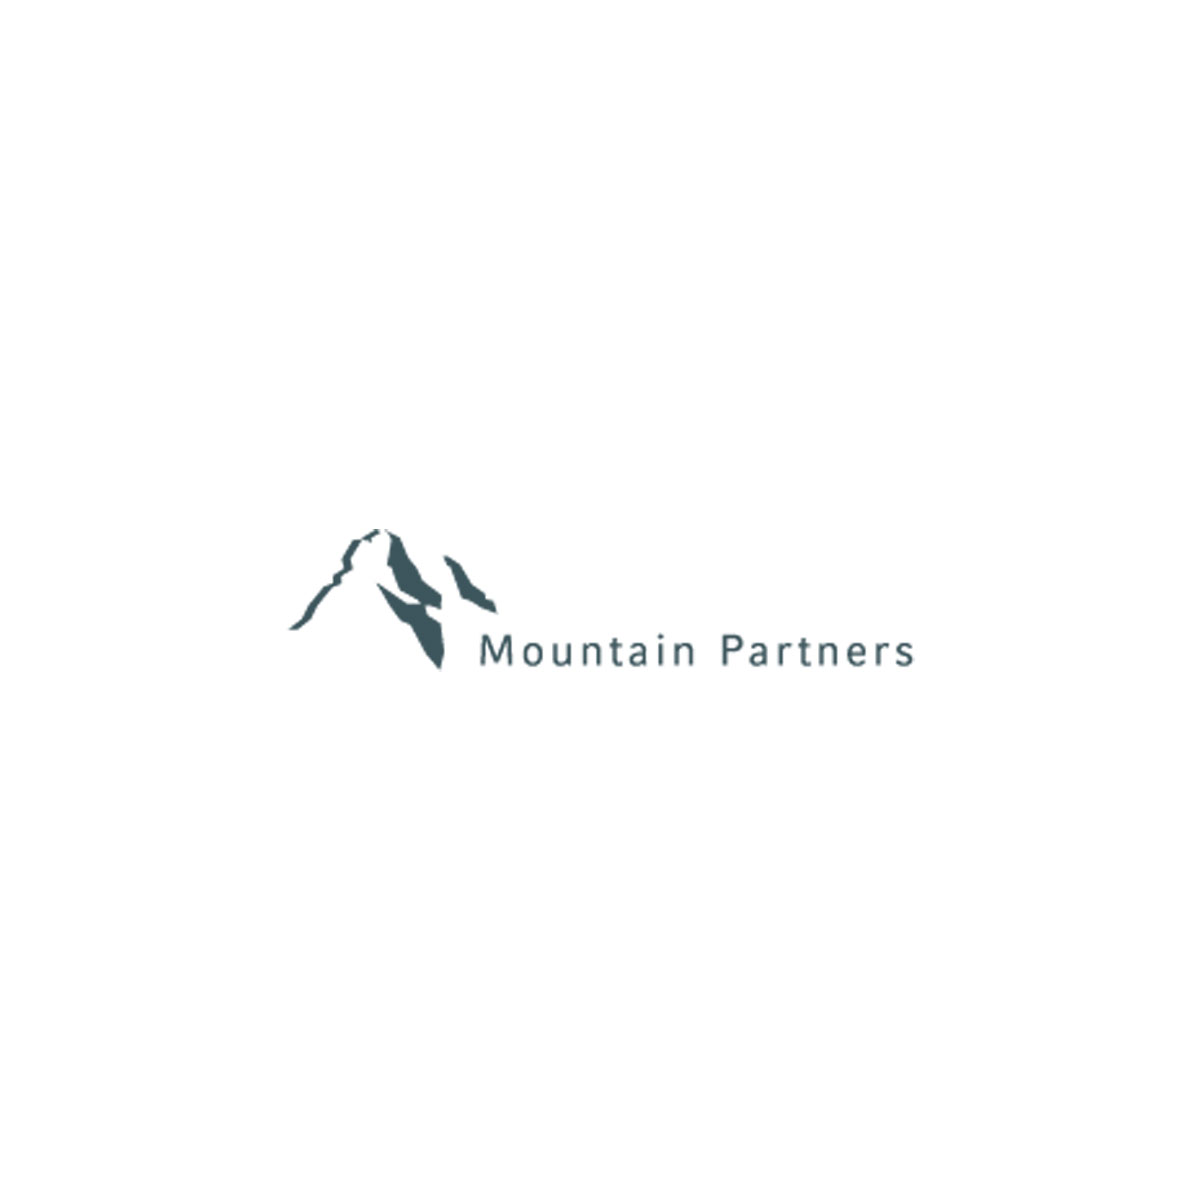 Mountain Partners